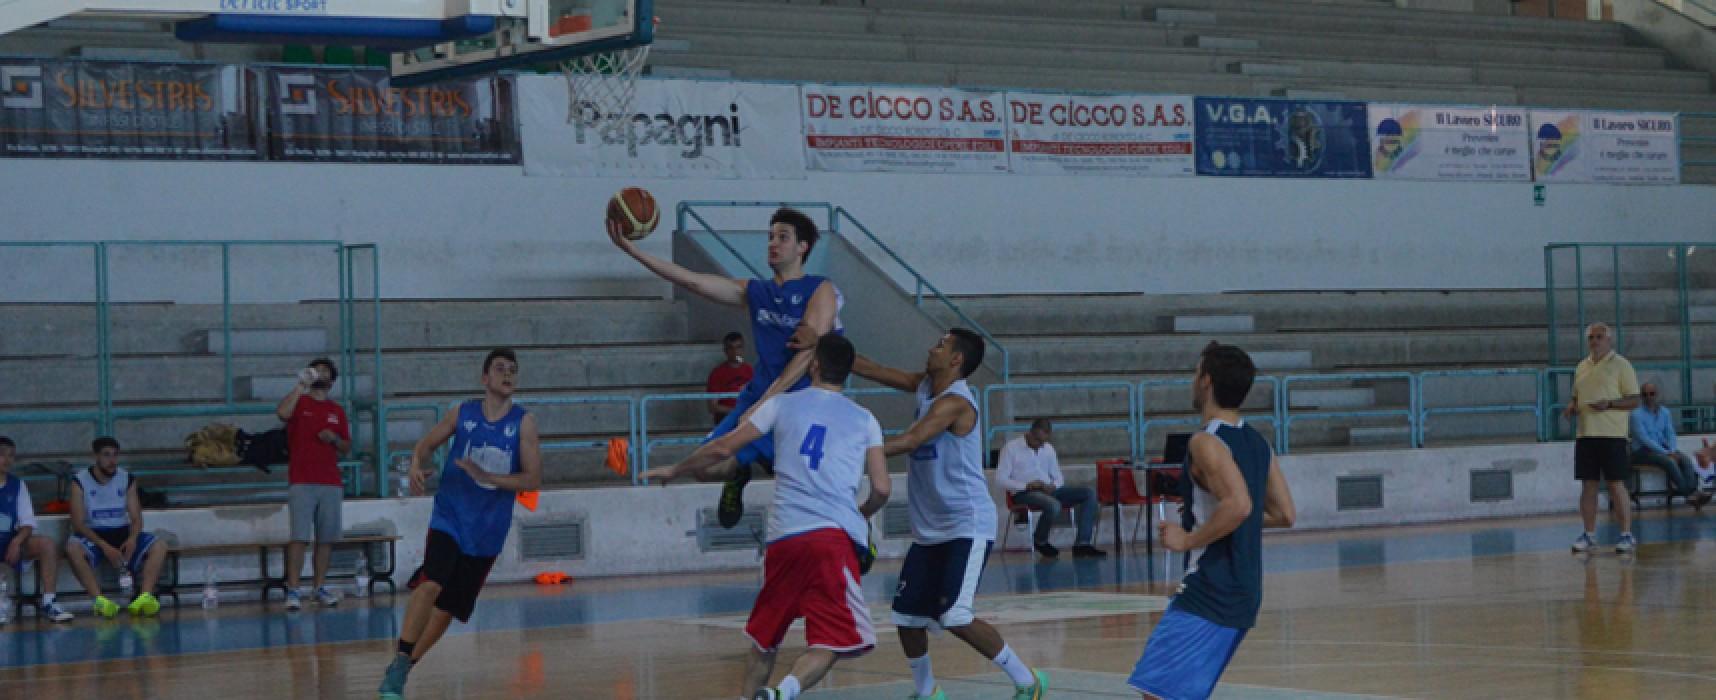 Playoff Basket, in casa Ambrosia fervono i preparativi per gara 1 ad Agropoli